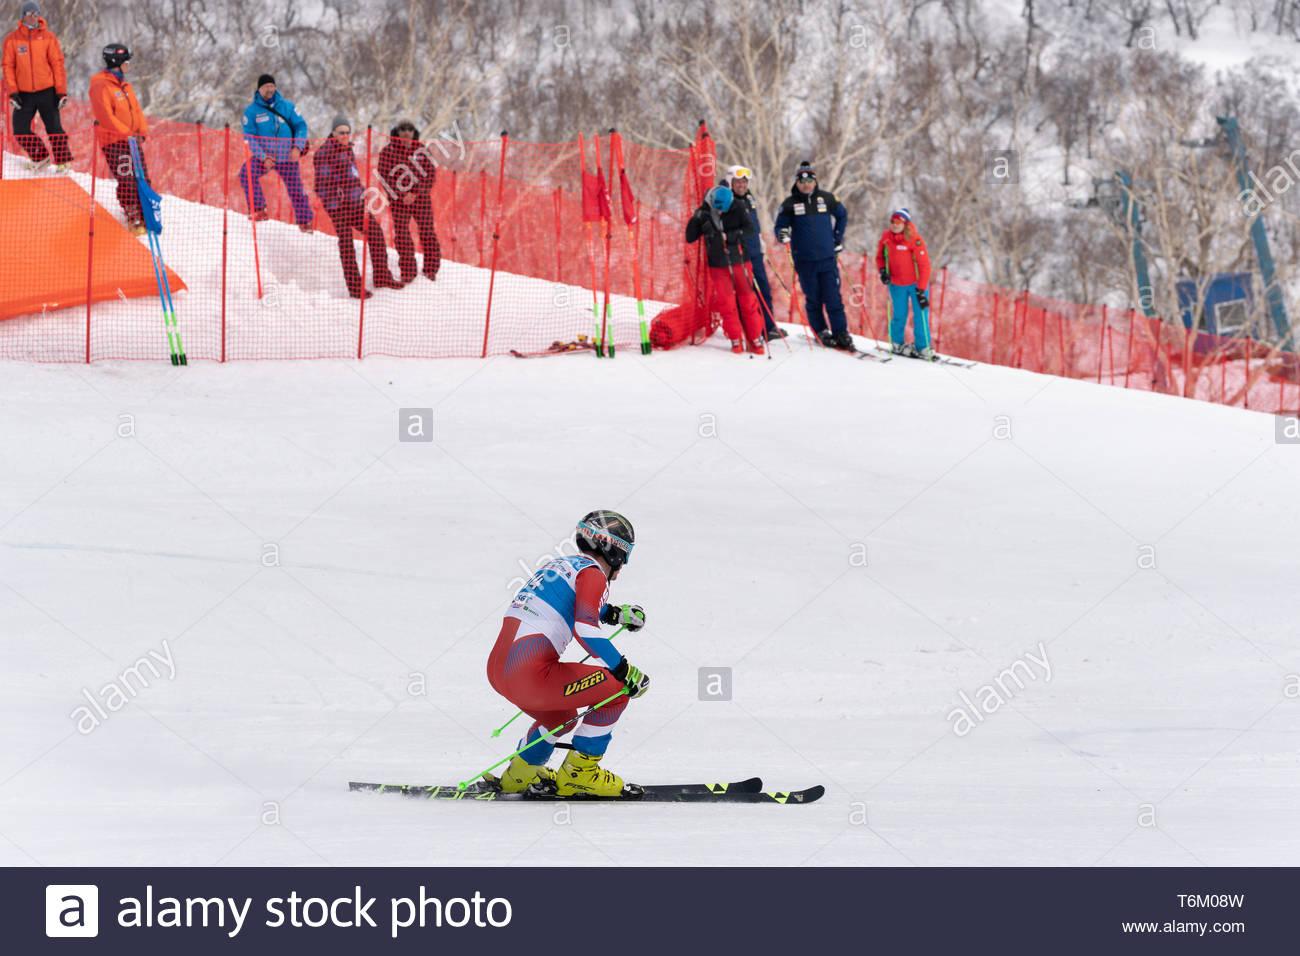 KAMCHATKA PENINSULA, RUSSIAN FEDERATION - APRIL 2, 2019: Russian Men's Alpine Skiing Championship - giant slalom. Mountain skier Ryabitsa Konstantin ( - Stock Image